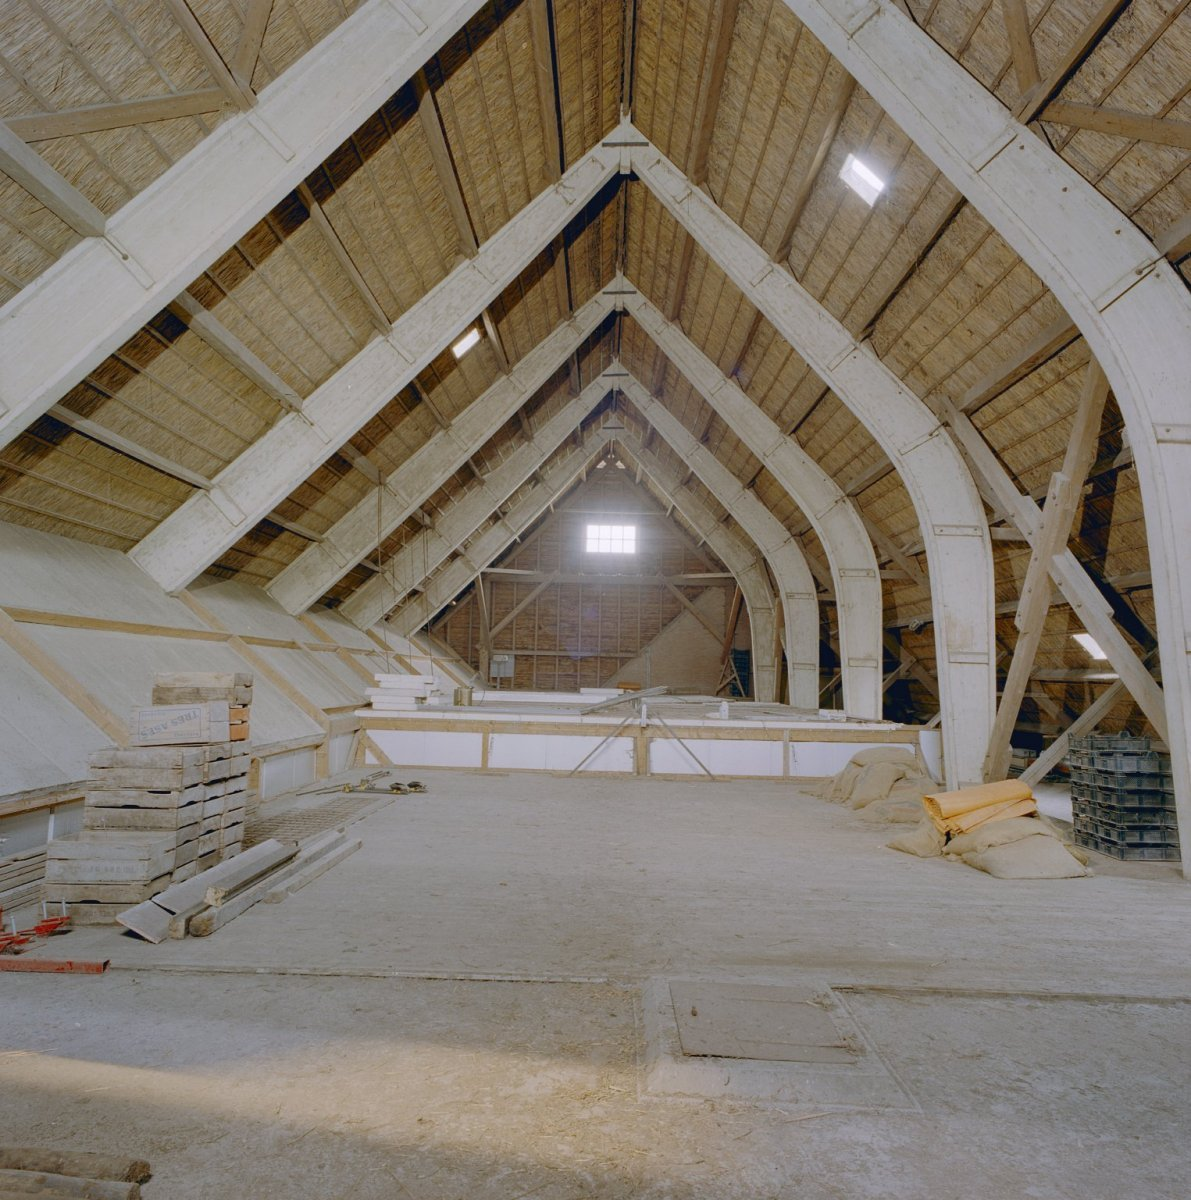 File:Interieur schuur, bovenverdieping, overzicht spanten ...